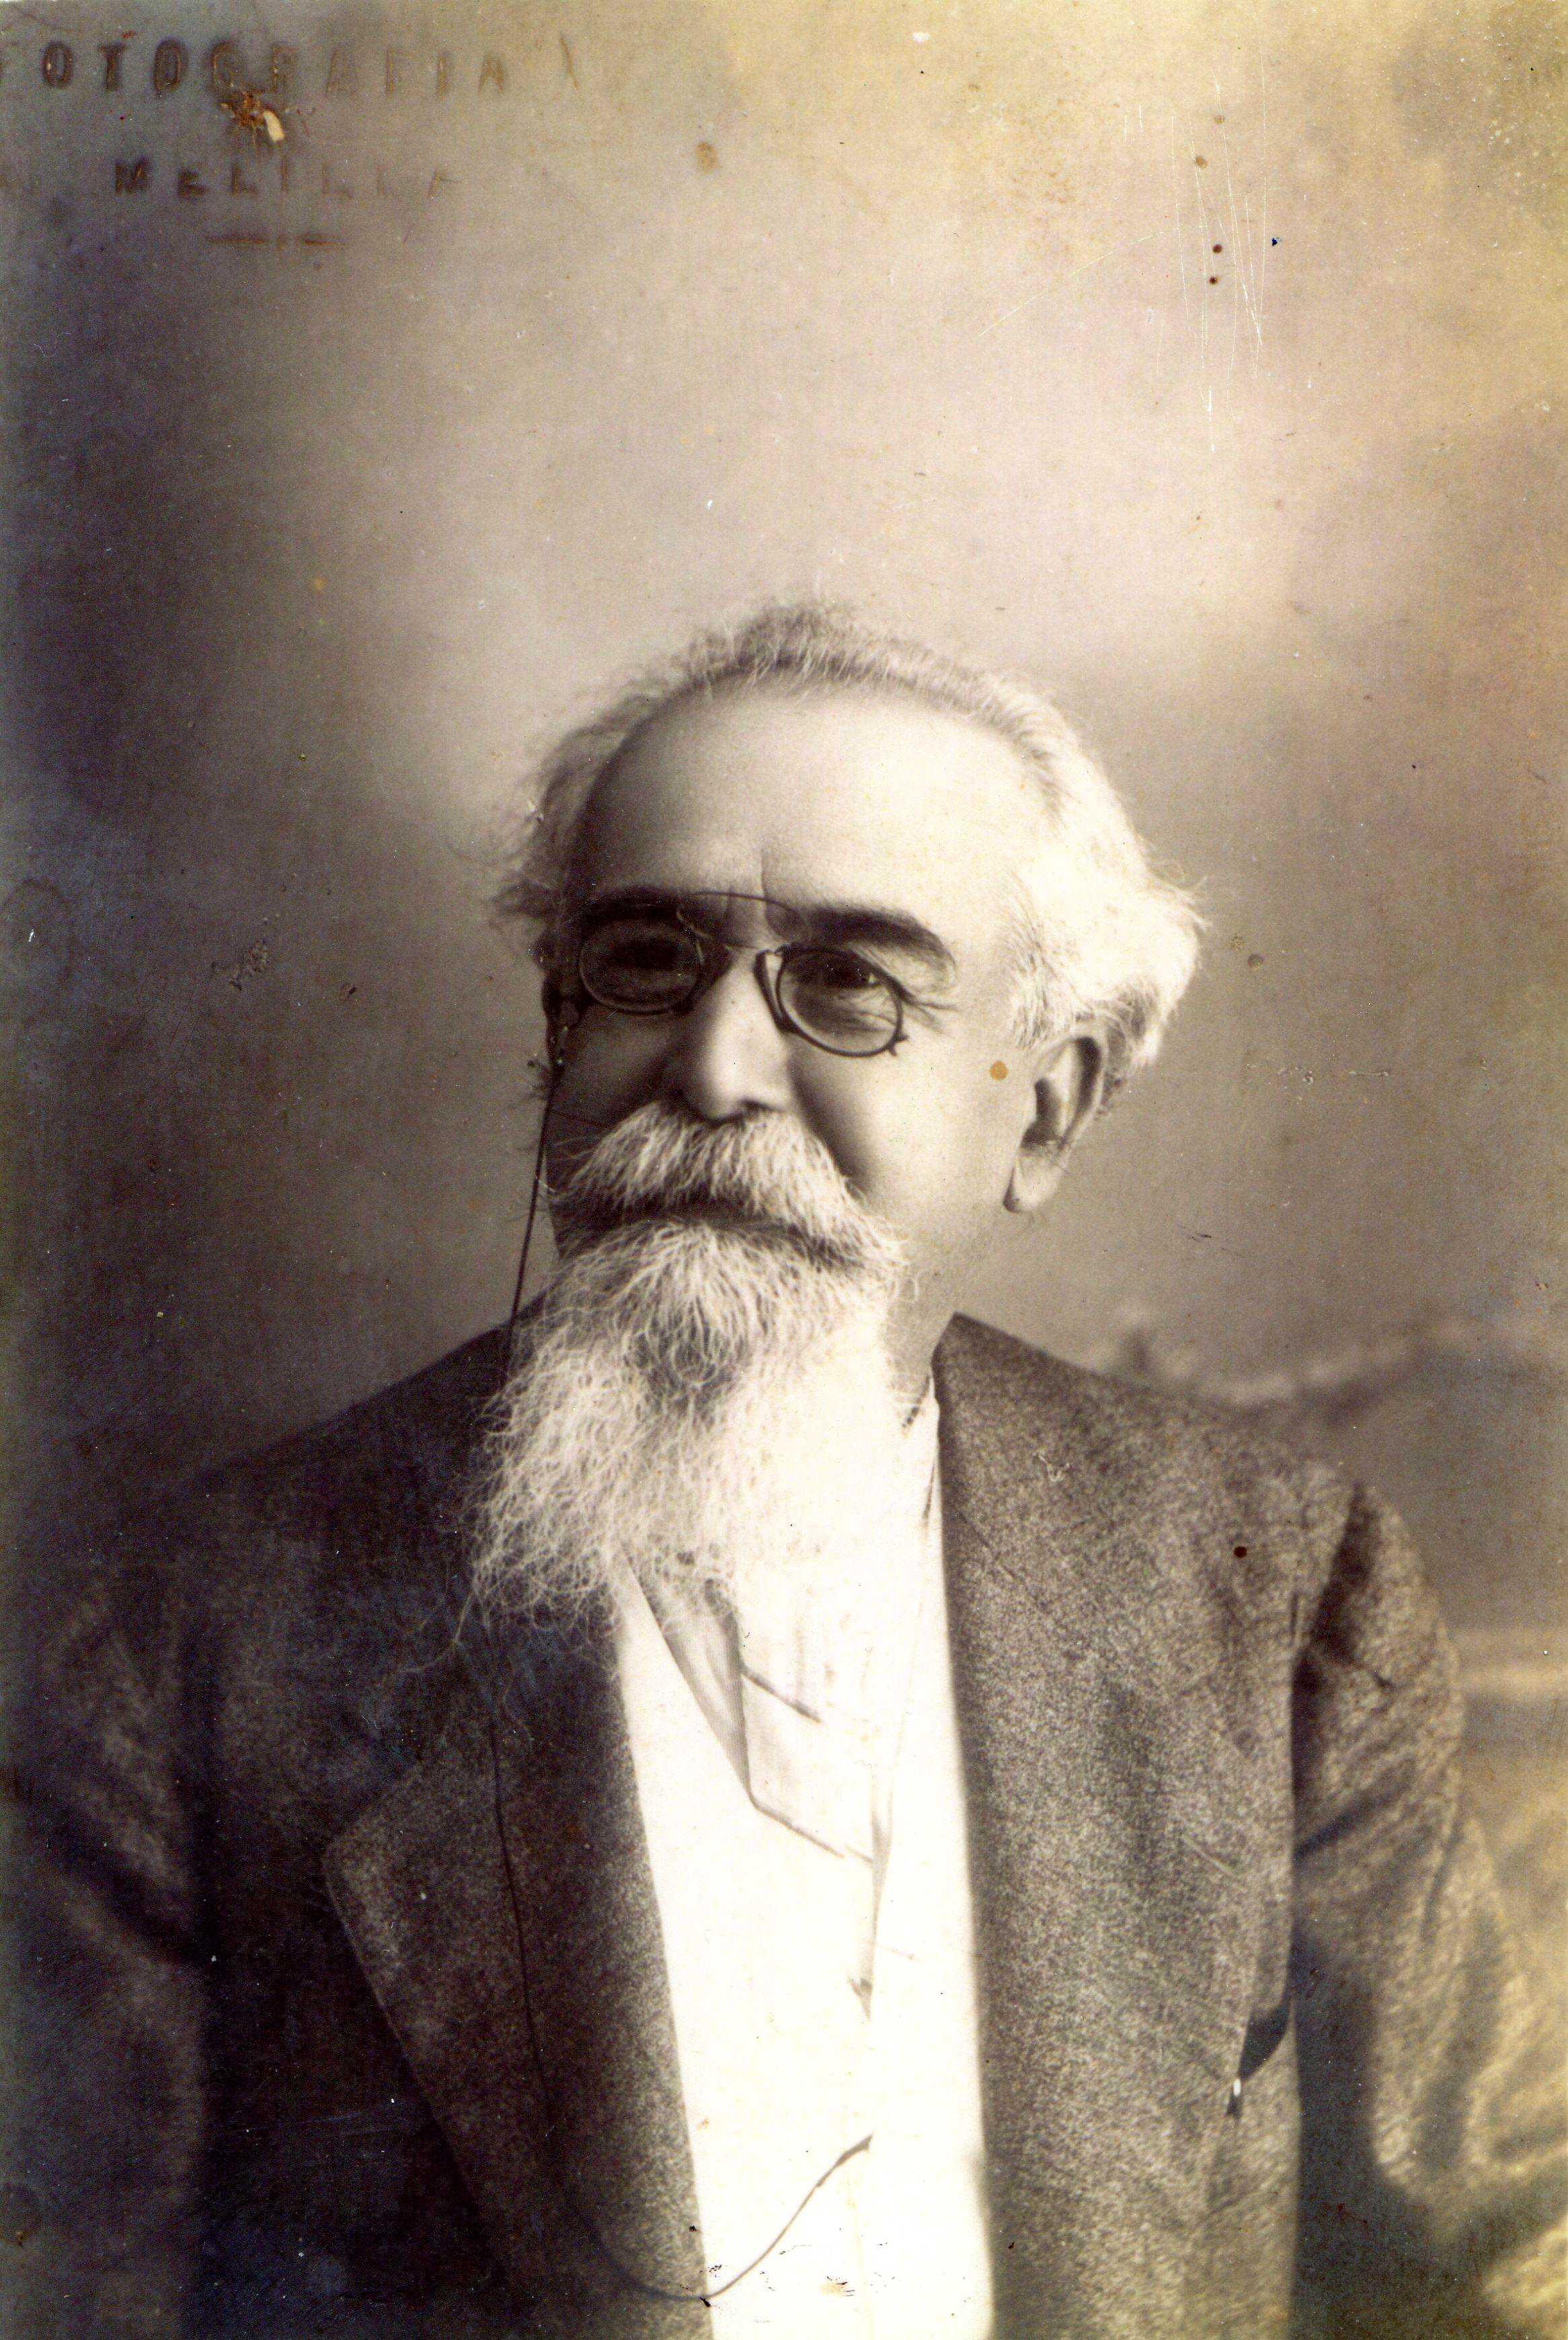 José García Viñas fotografiat a Melilla